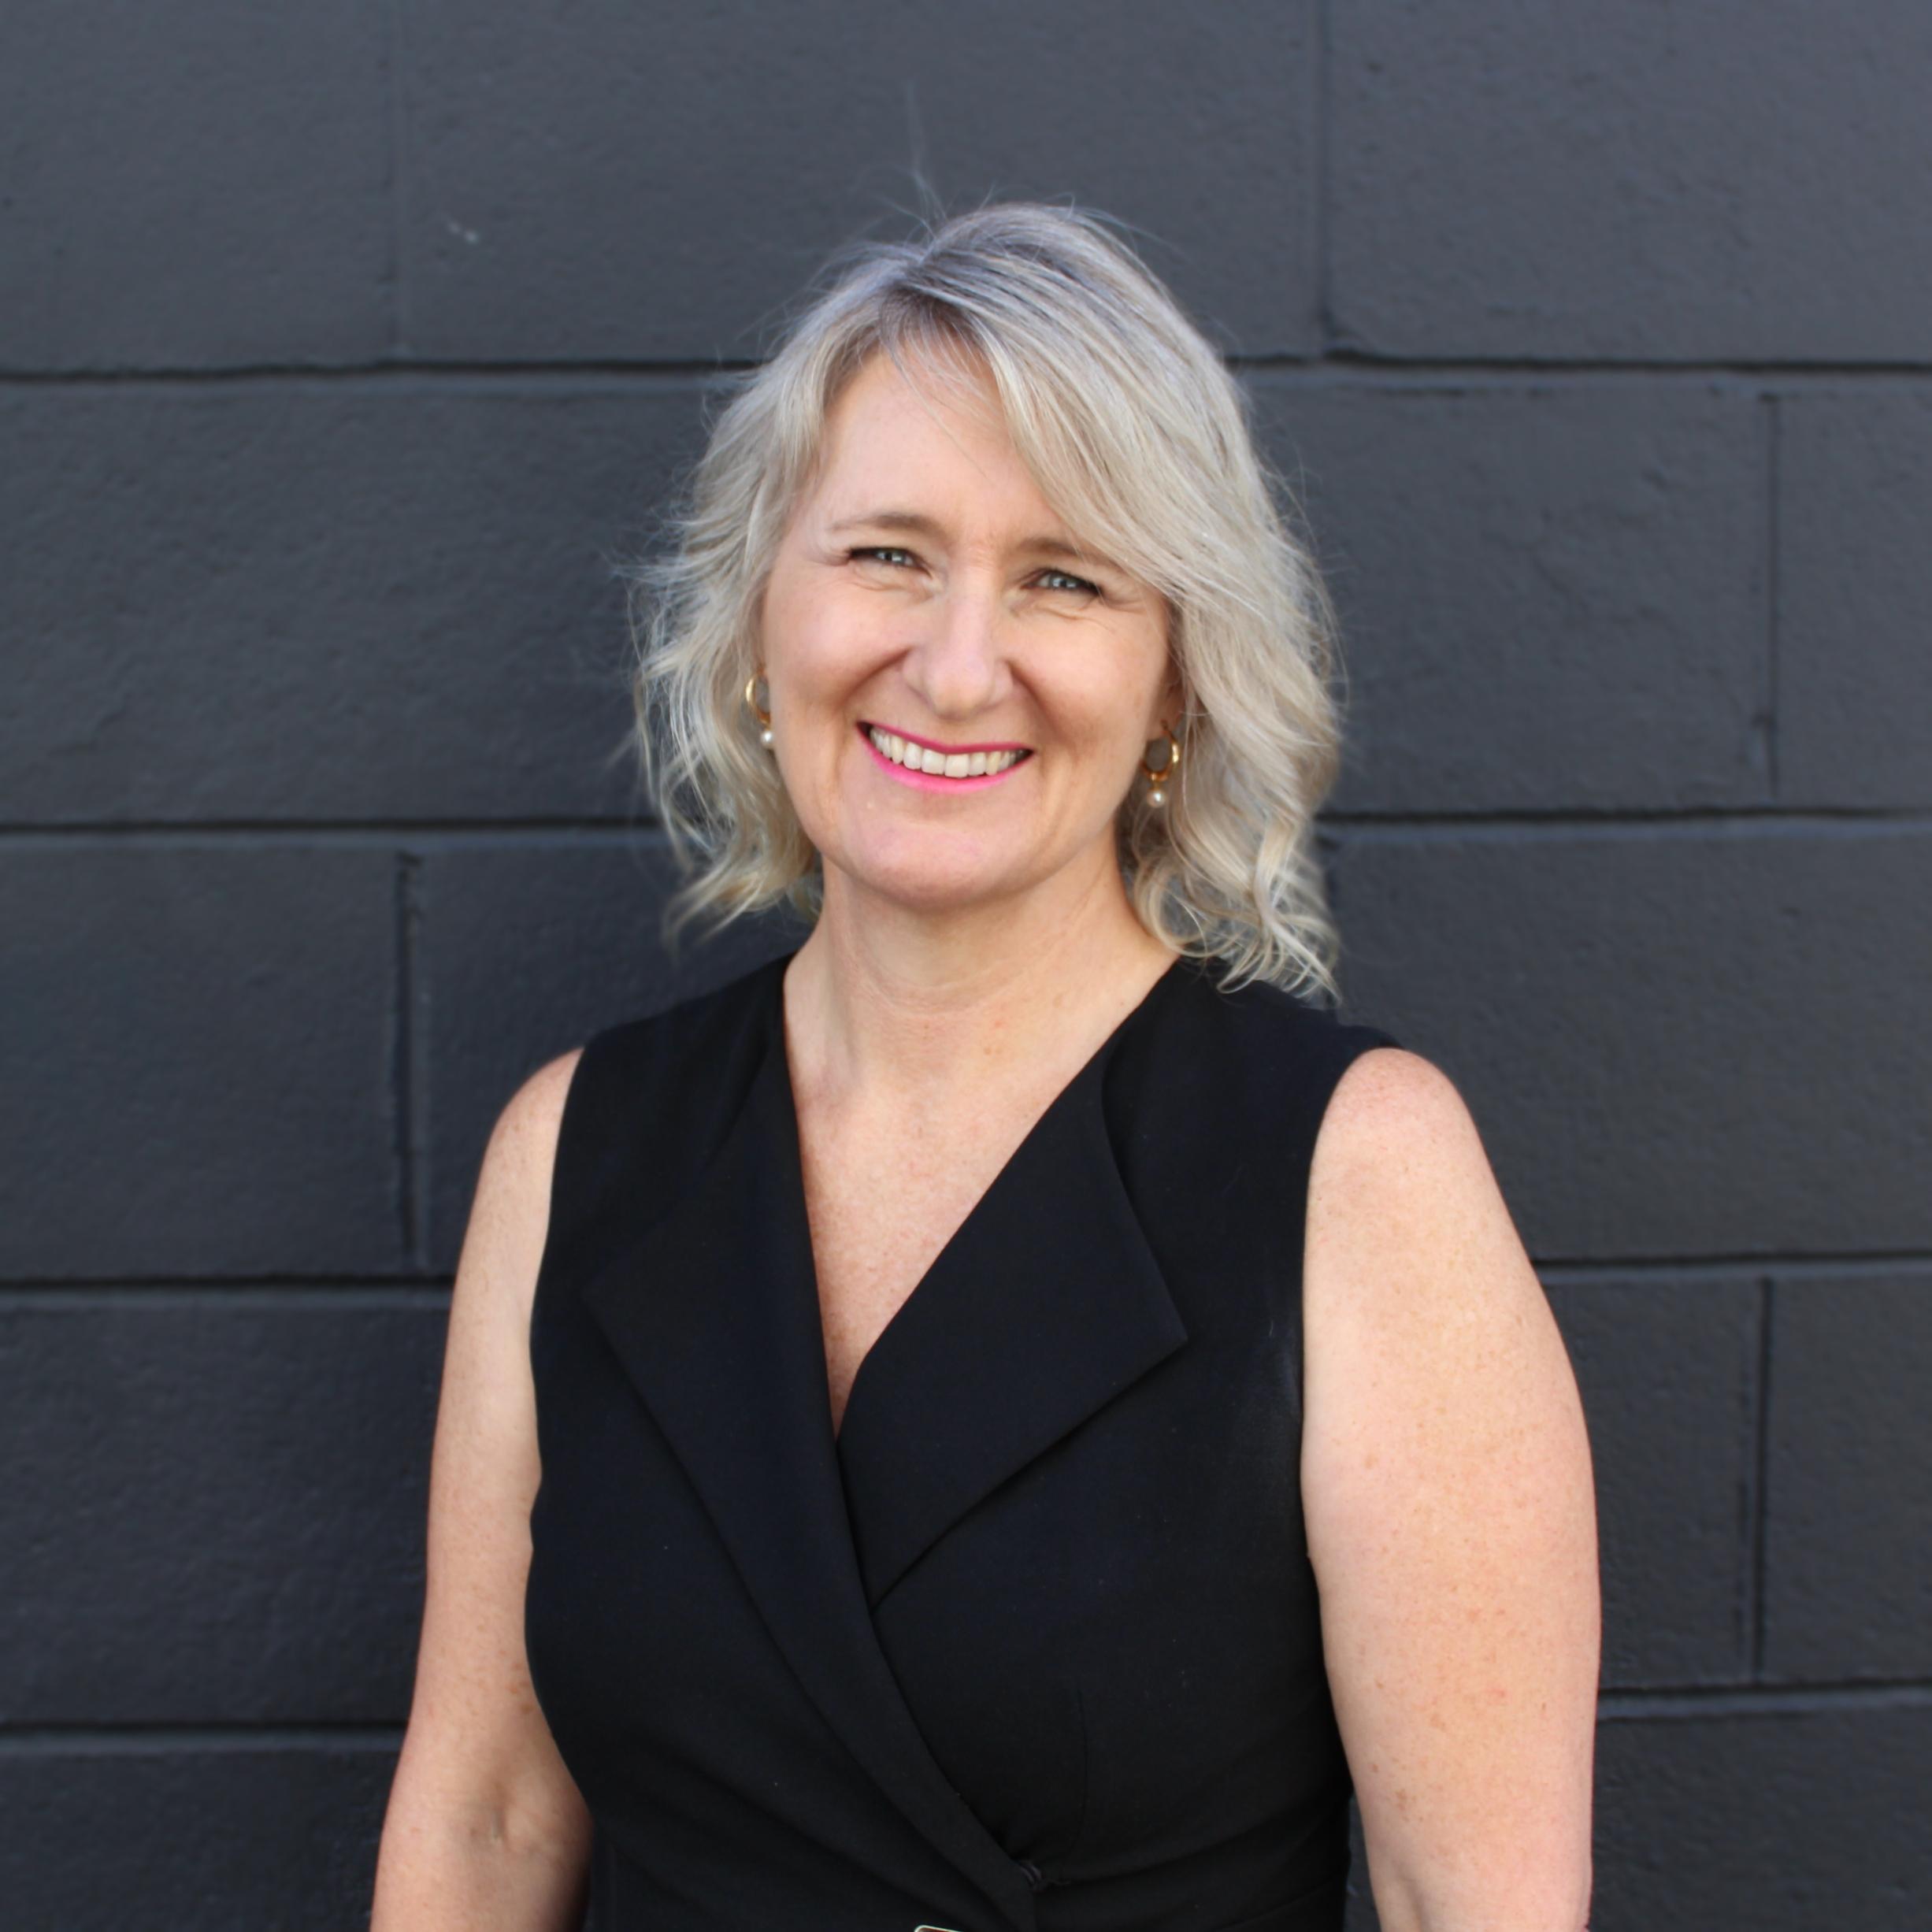 Sharon Macquarie